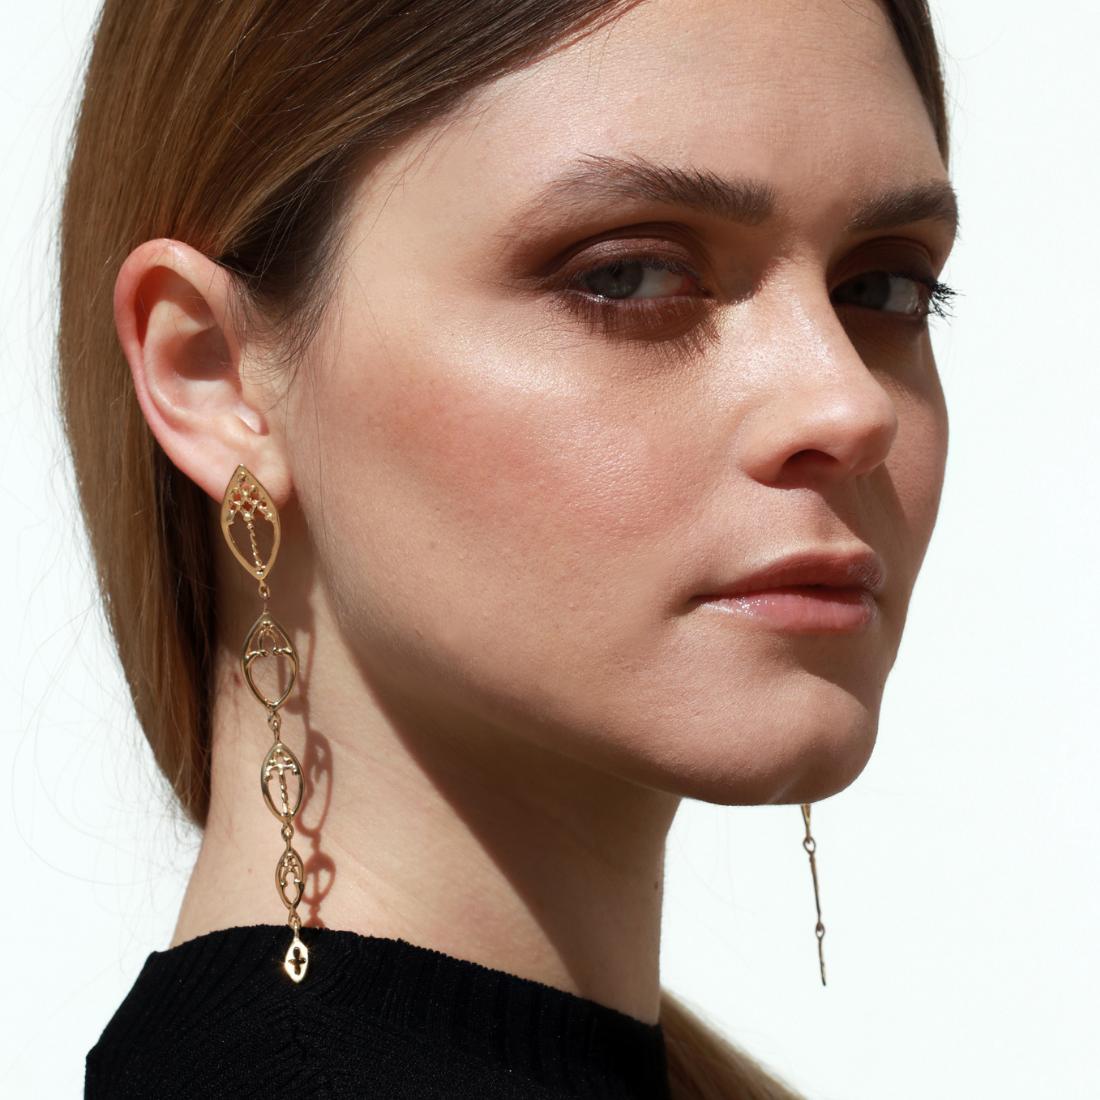 Venetian Windows Earrings Rose Gold Plated Silver